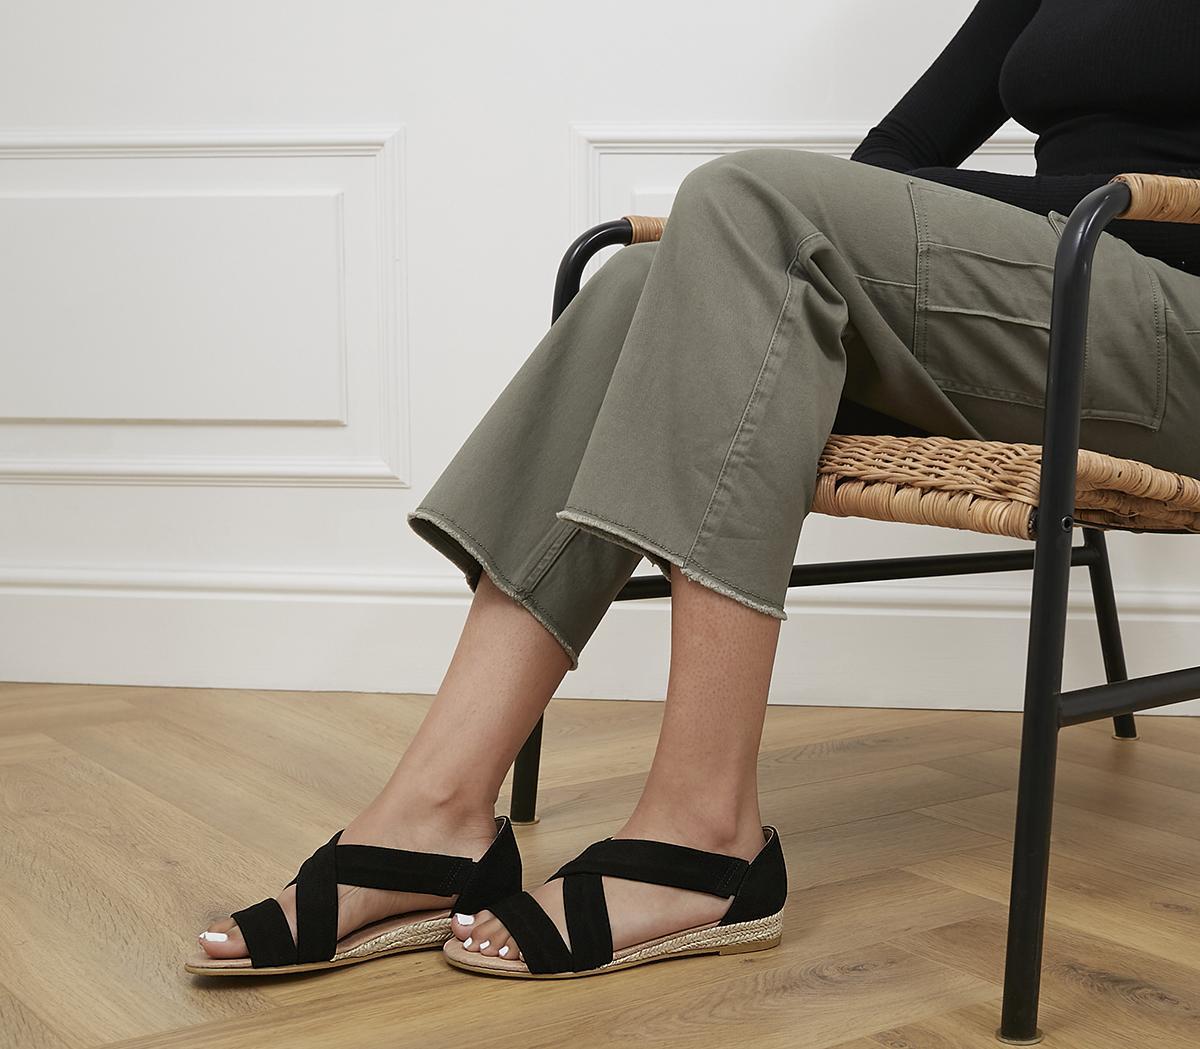 Hallie Cross Strap Espadrilles Sandals